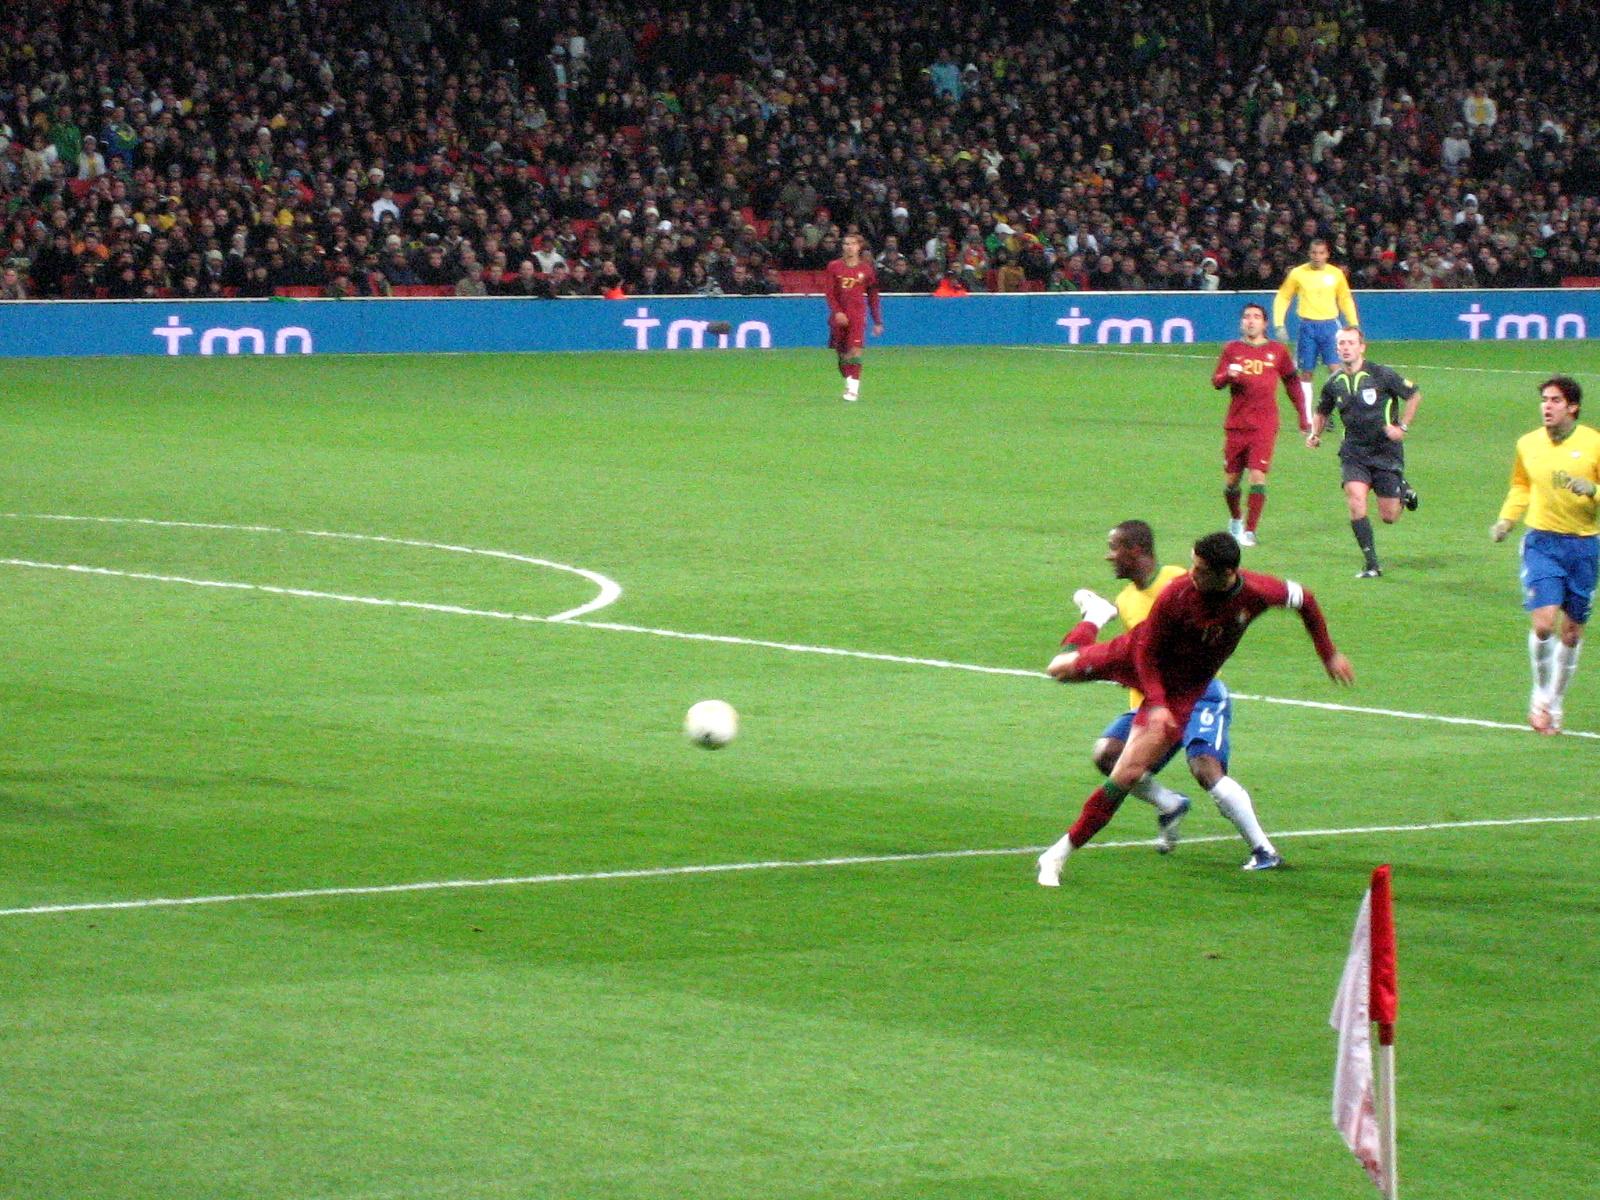 Campeonato do Mundo da FIFA de 2006 f88d8c438bba9